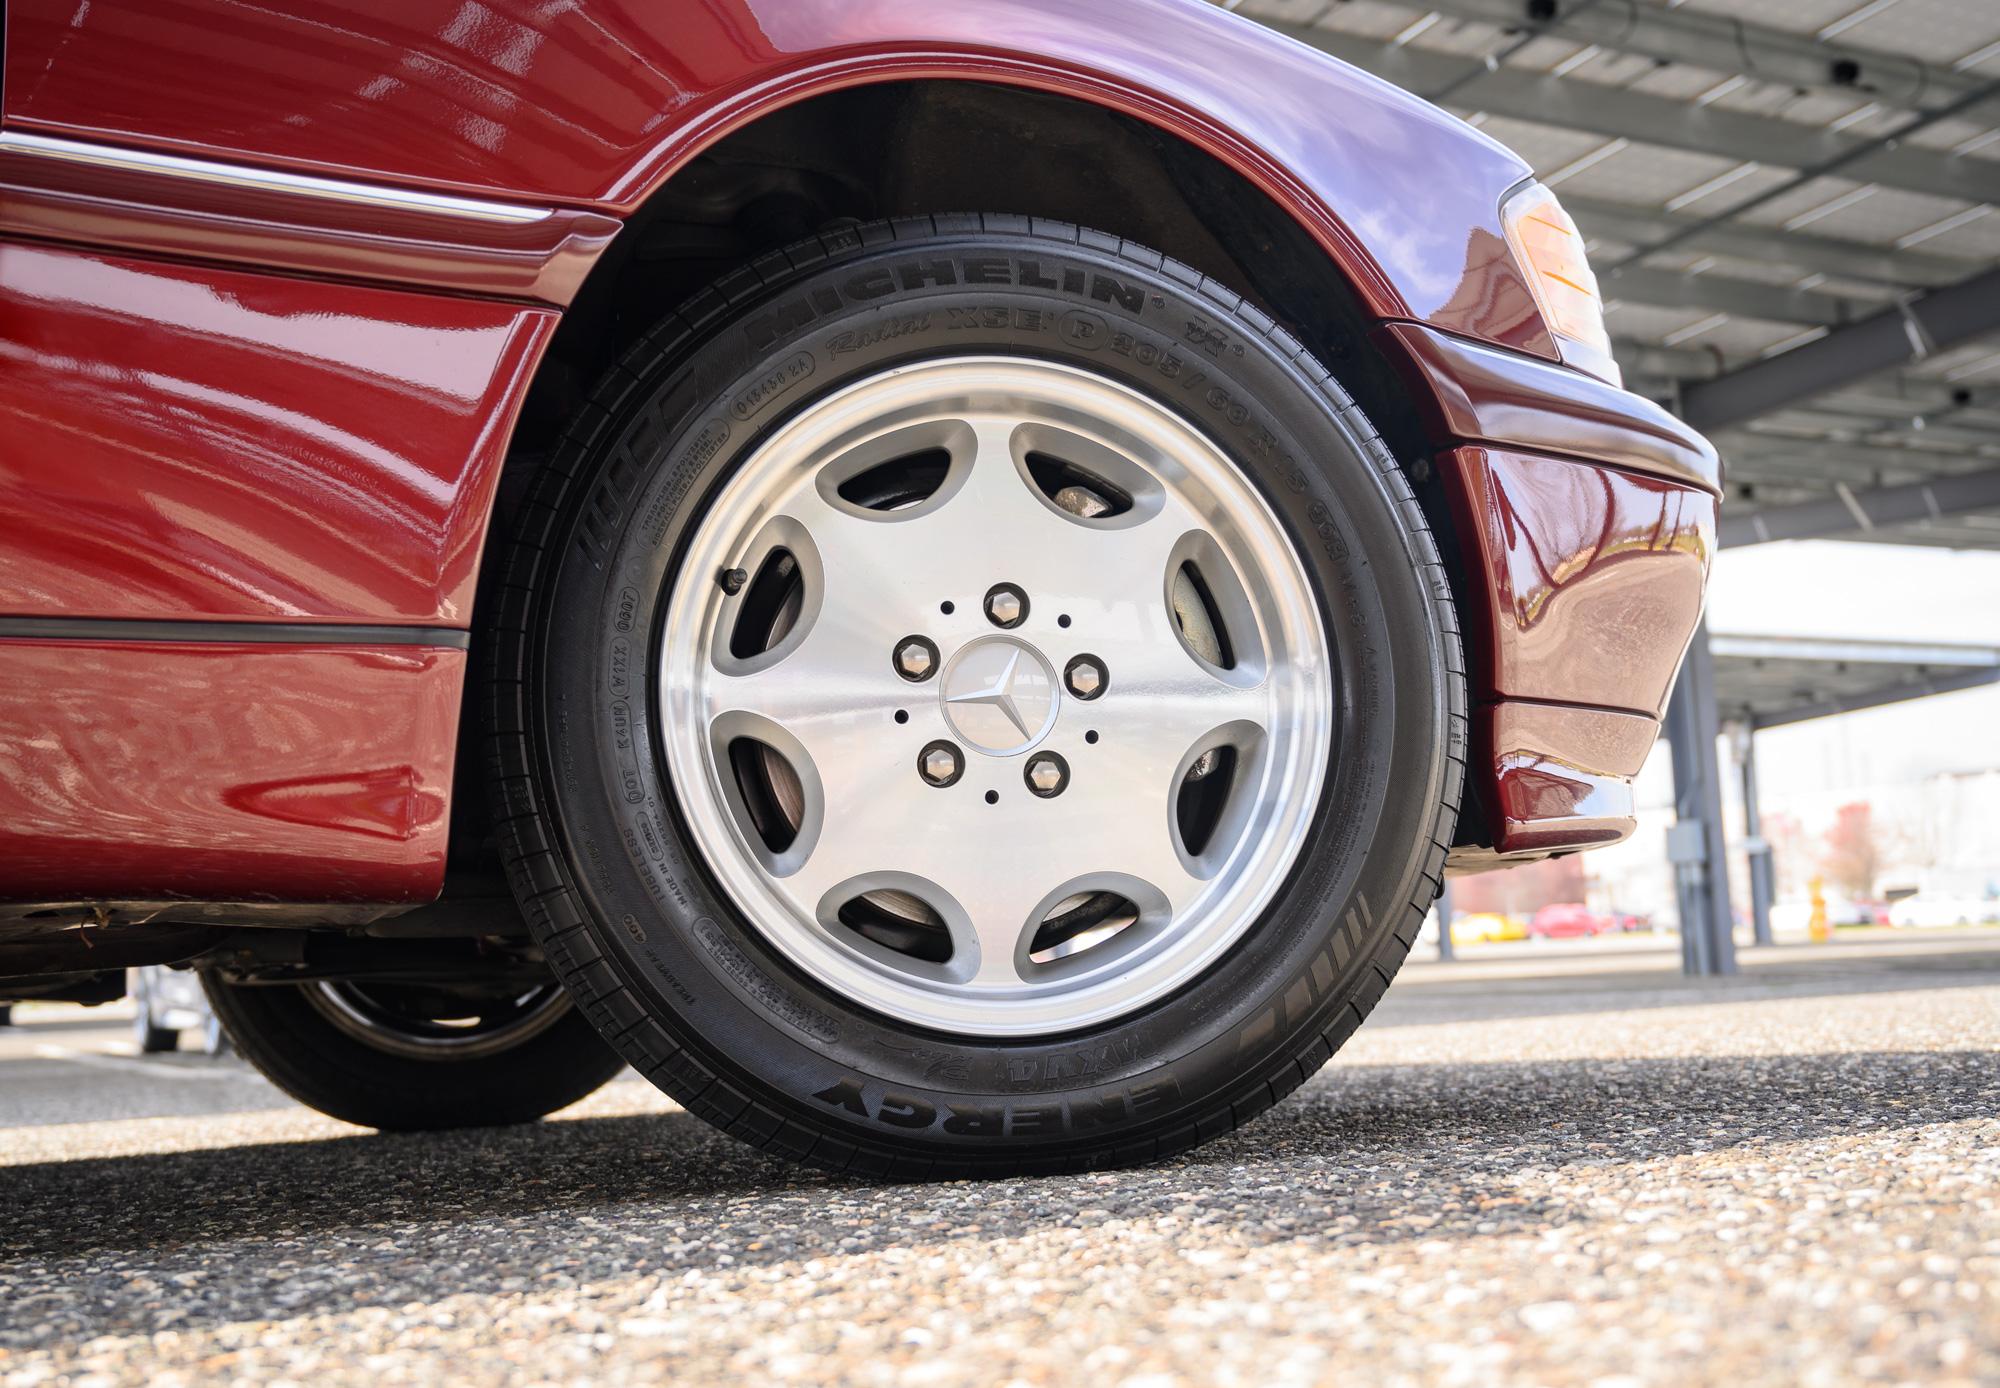 Mercedes C Class wheel